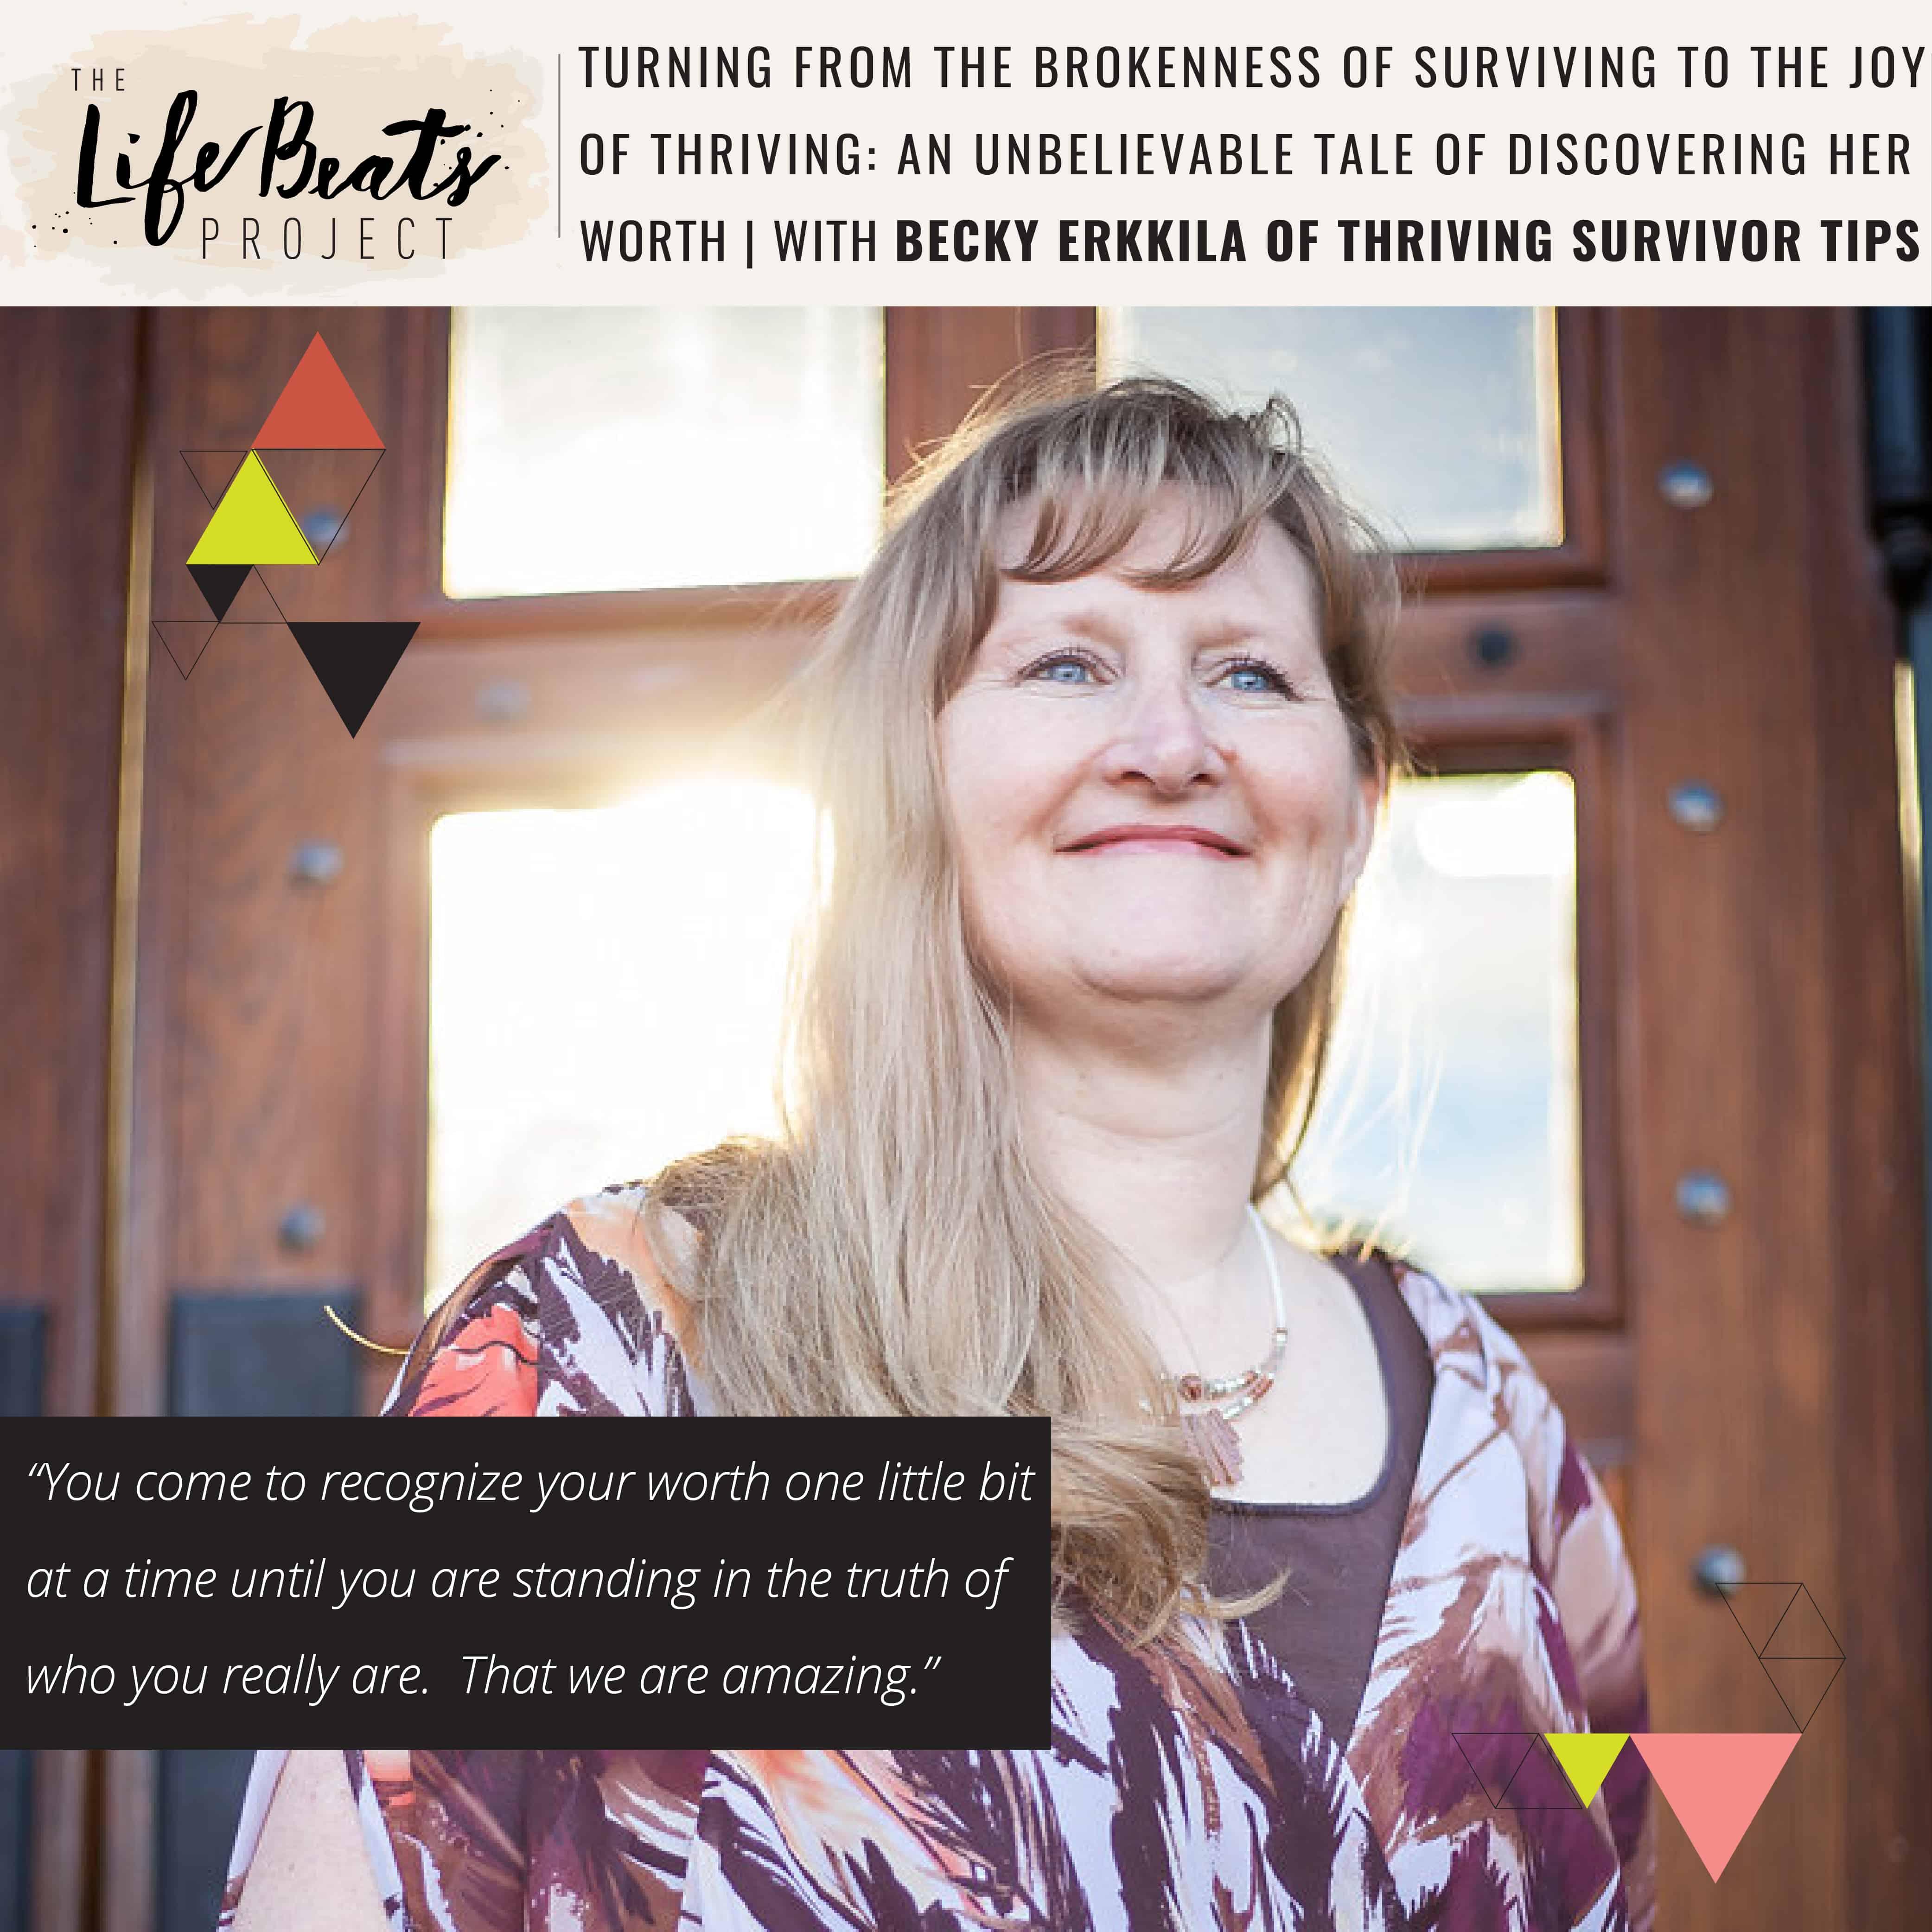 domestic abuse, kidnapping, rape, sexual abuse, beaten broken hope self worth love nursing school joy thriving survival tips Becky Erkkila podcast